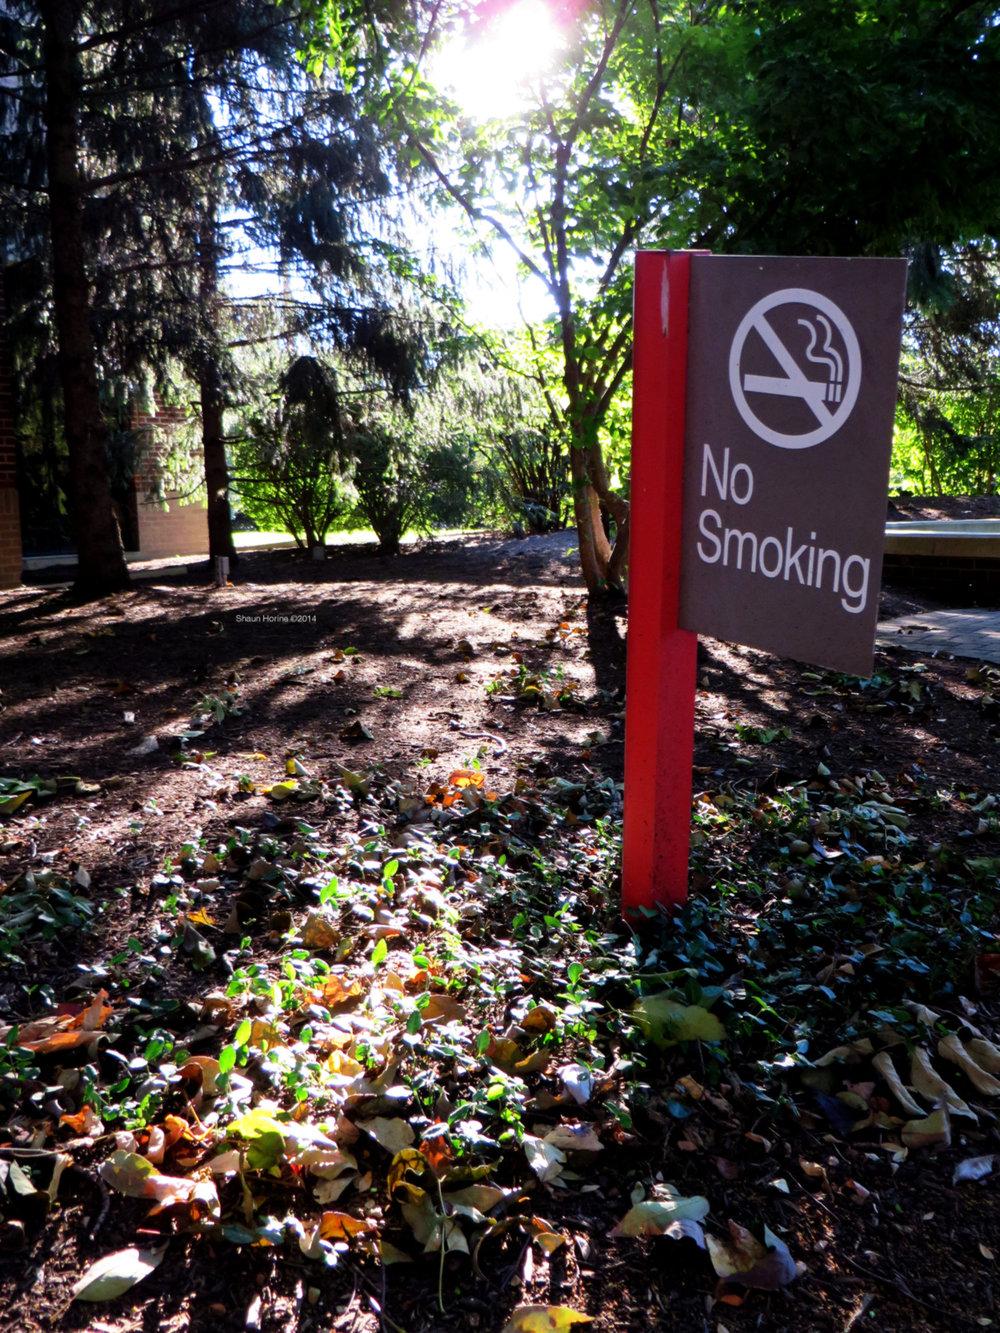 No smoking sign near the fountain. Baptist Hospital Lexington, KY. Canon SX280 HS